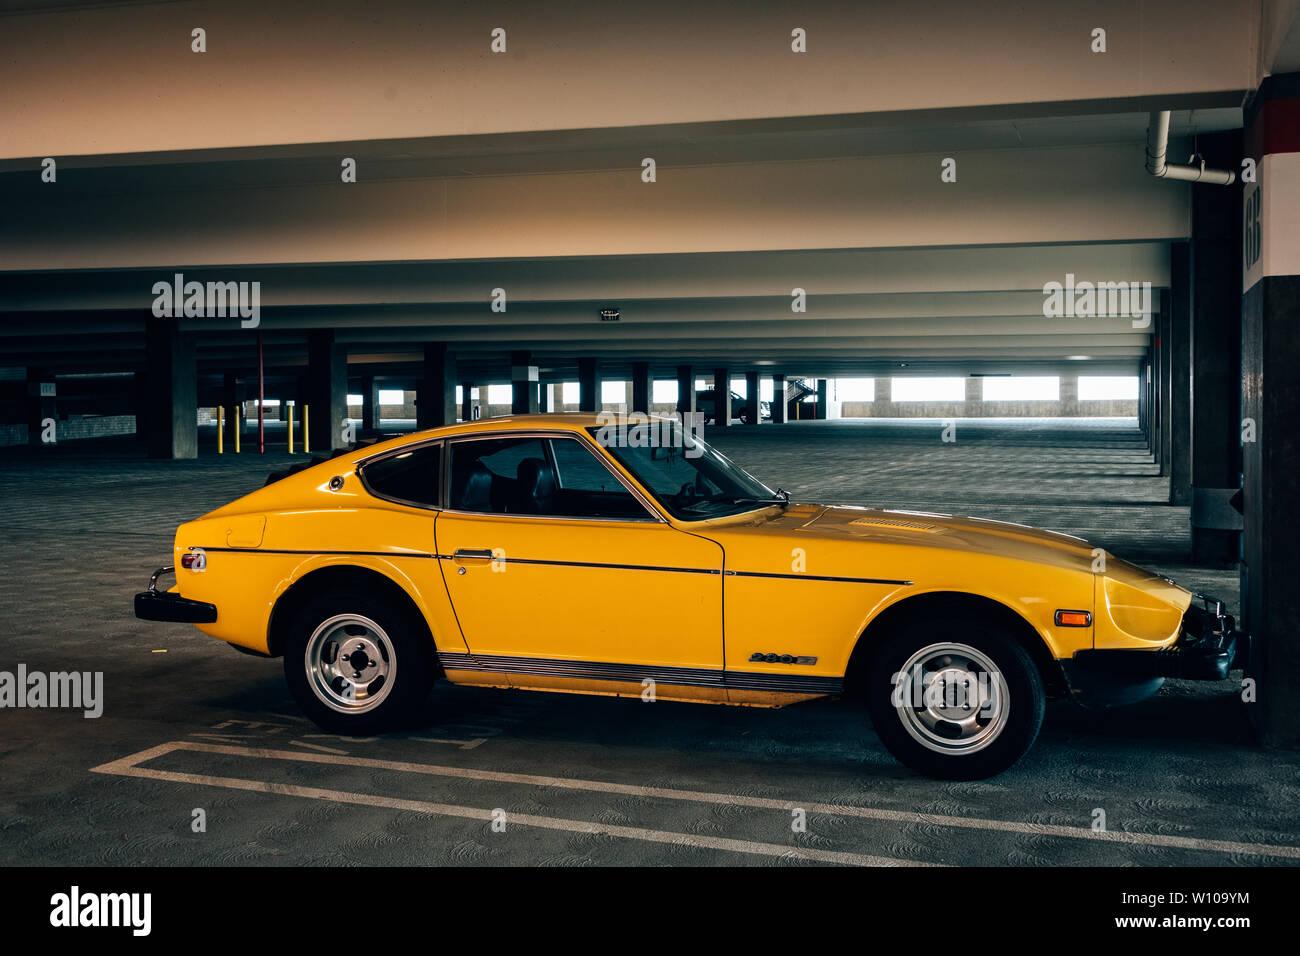 a vintage yellow nissan 280z in los angeles california stock photo alamy https www alamy com a vintage yellow nissan 280z in los angeles california image258778008 html